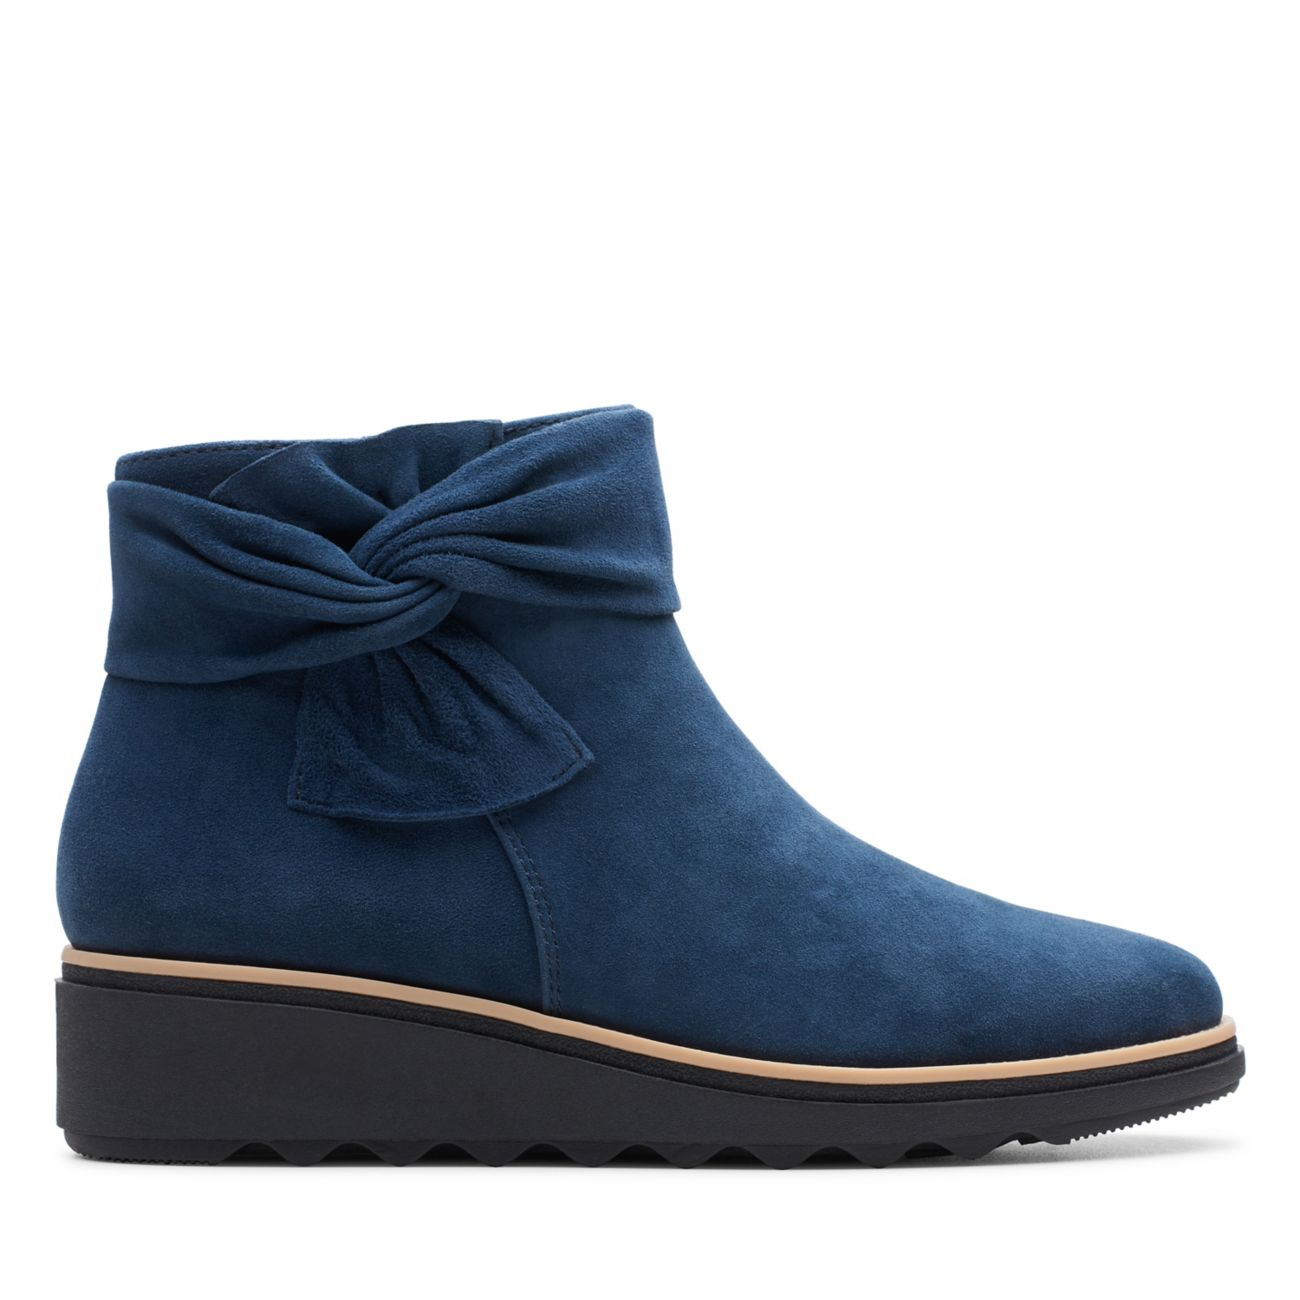 Sharon Salon Navy Suede - Clarks® Shoes Official Site | Clarks